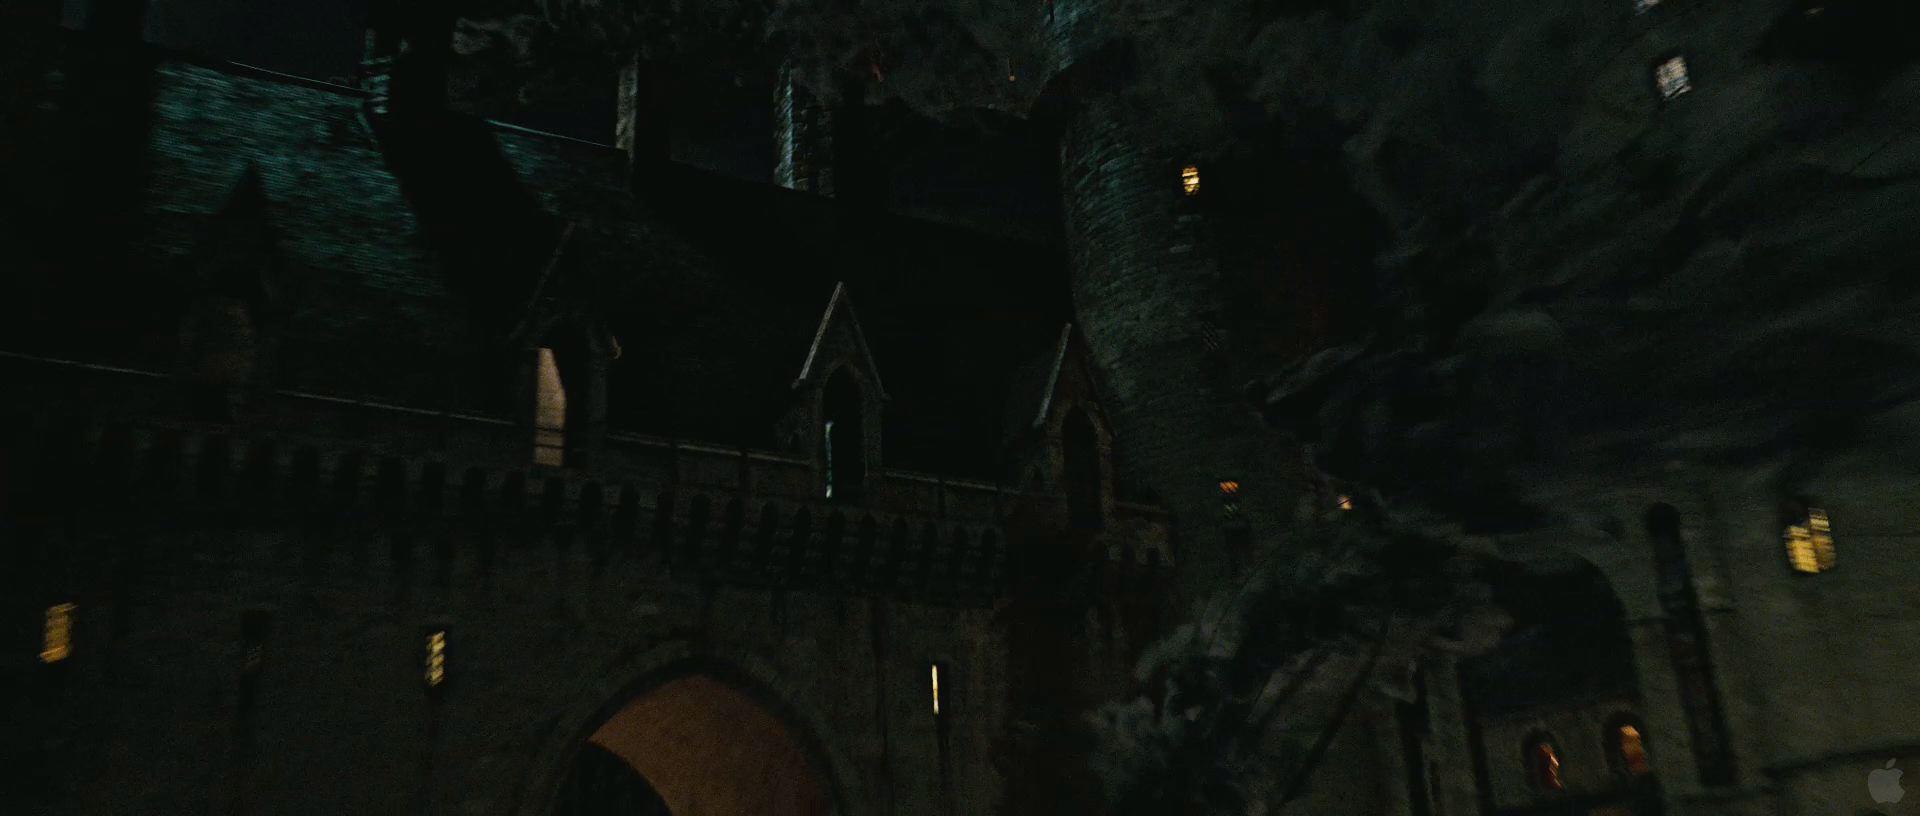 Harry Potter BlogHogwarts HP7 2 Trailer 33